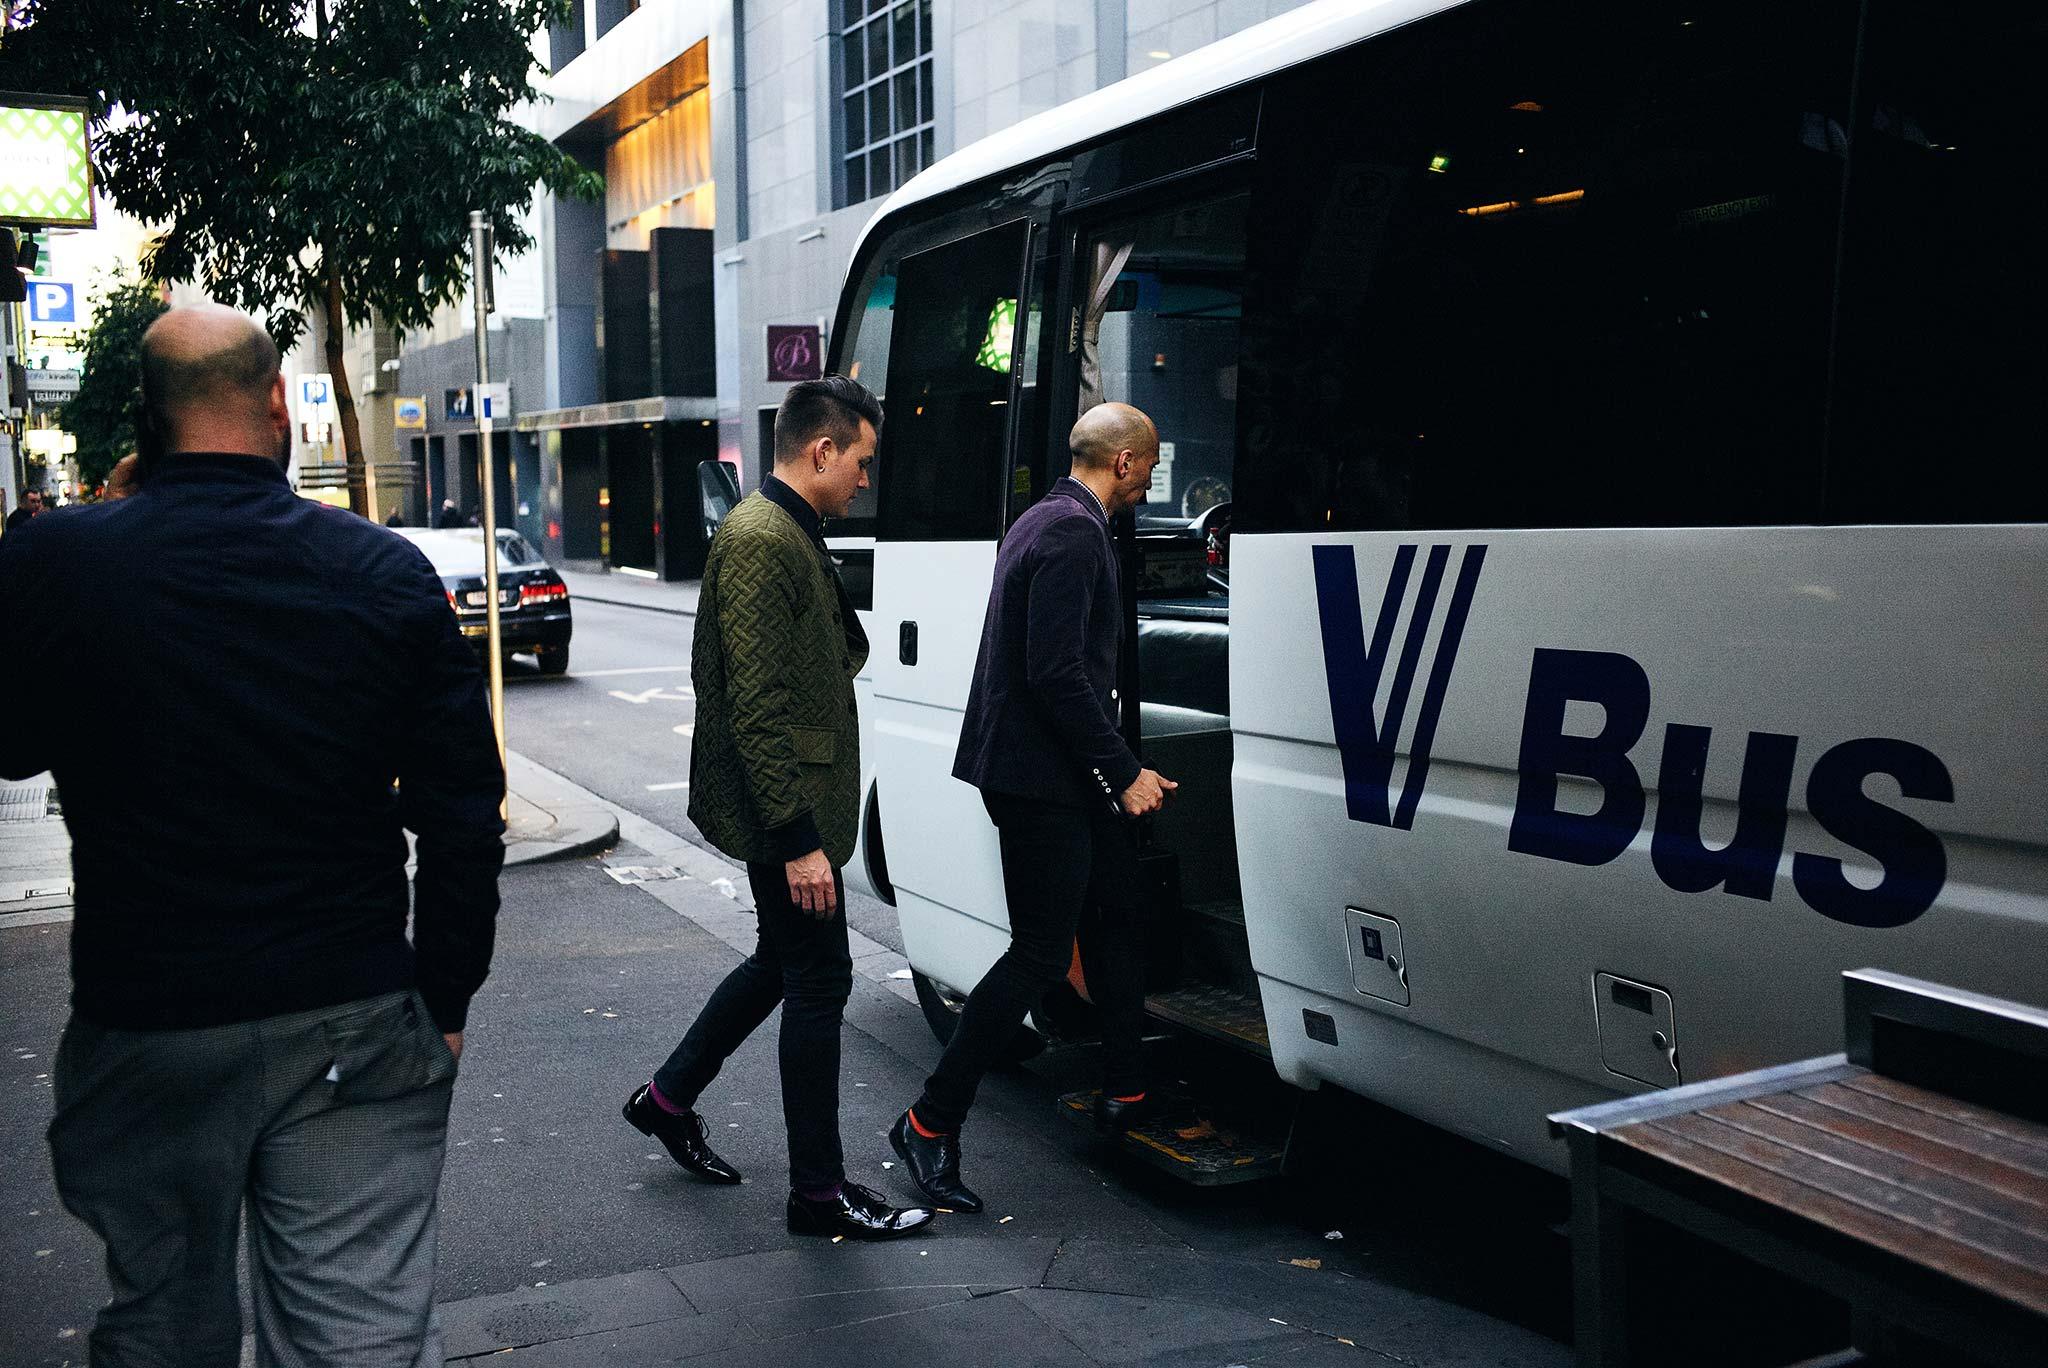 Melbourne-tour-bus-wedding-bride